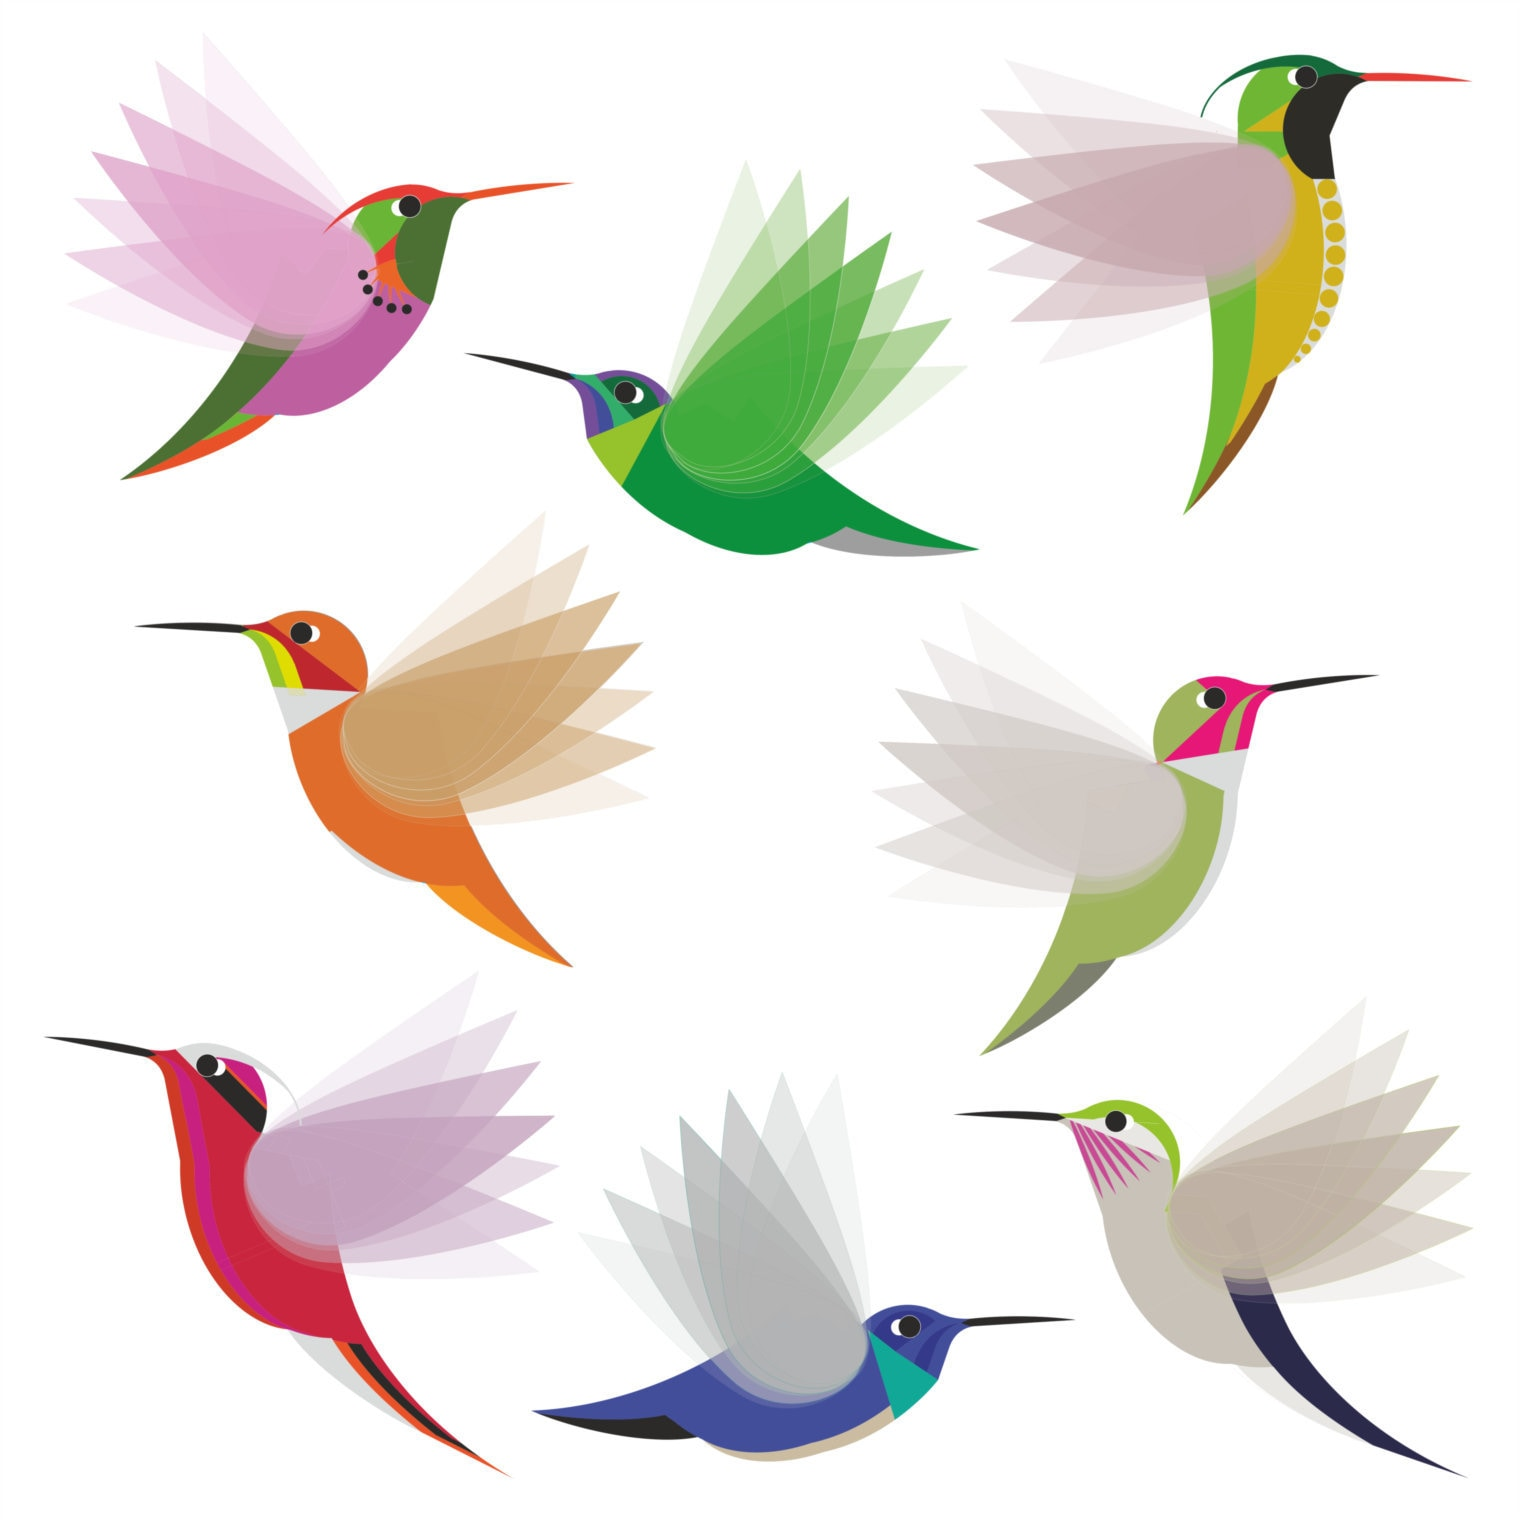 Beautiful Vibrant Colored Hummingbird Art #4 Vinyl Decal Sticker Shinobi Stickers 4 Wide